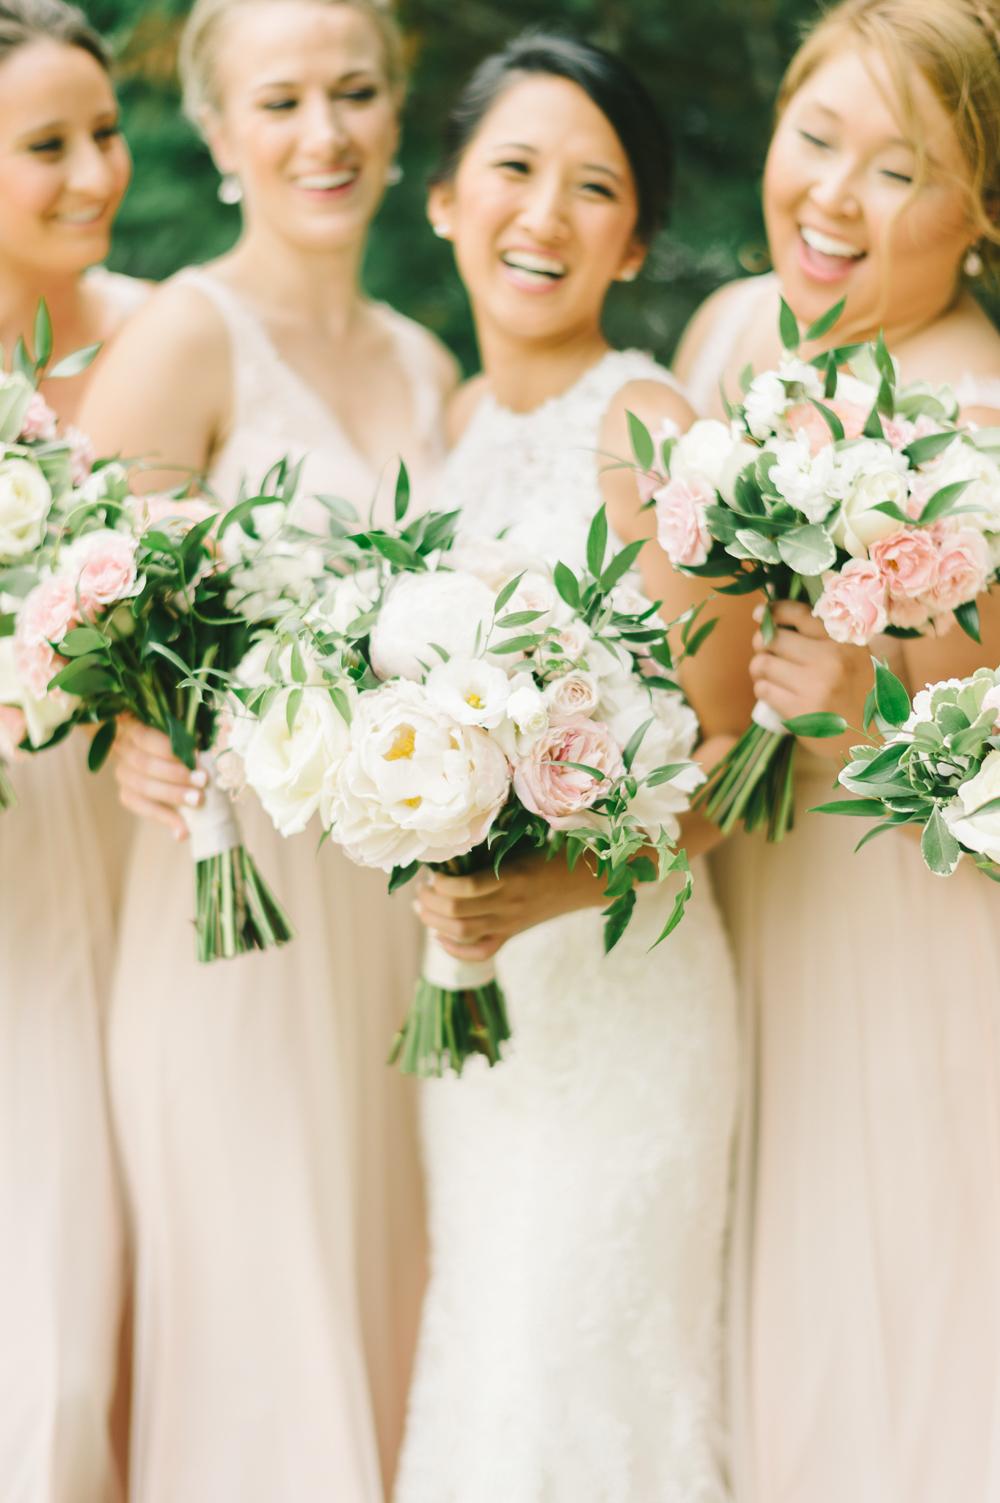 557ecfba1c blush wedding Archives - Southern Weddings